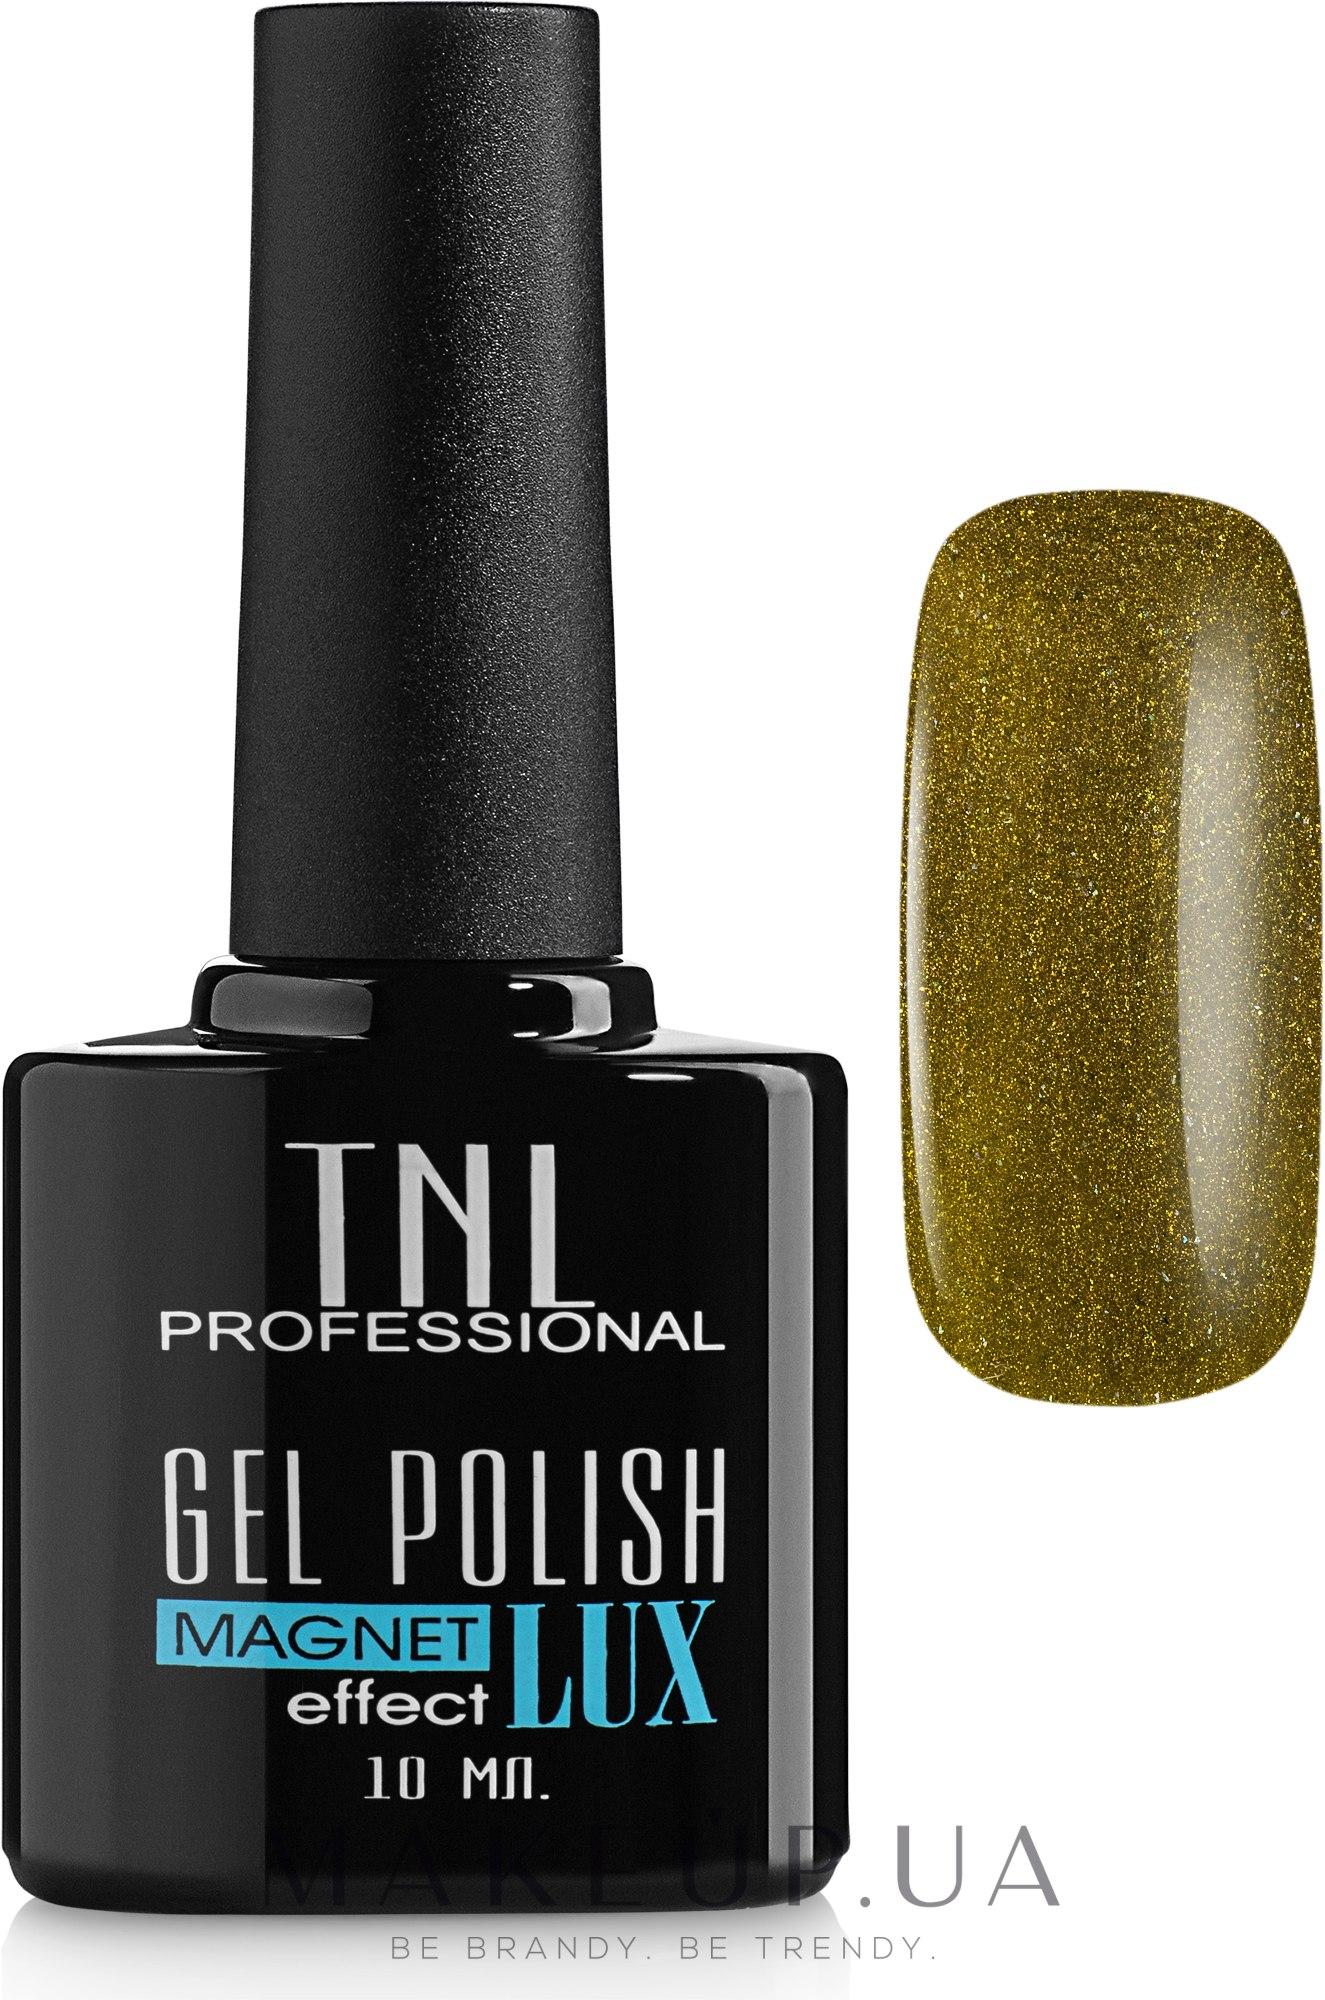 Гель-лак для нігтів - TNL Professional Gel Polish Magnet LUX — фото 14 - Оливковый с блестками